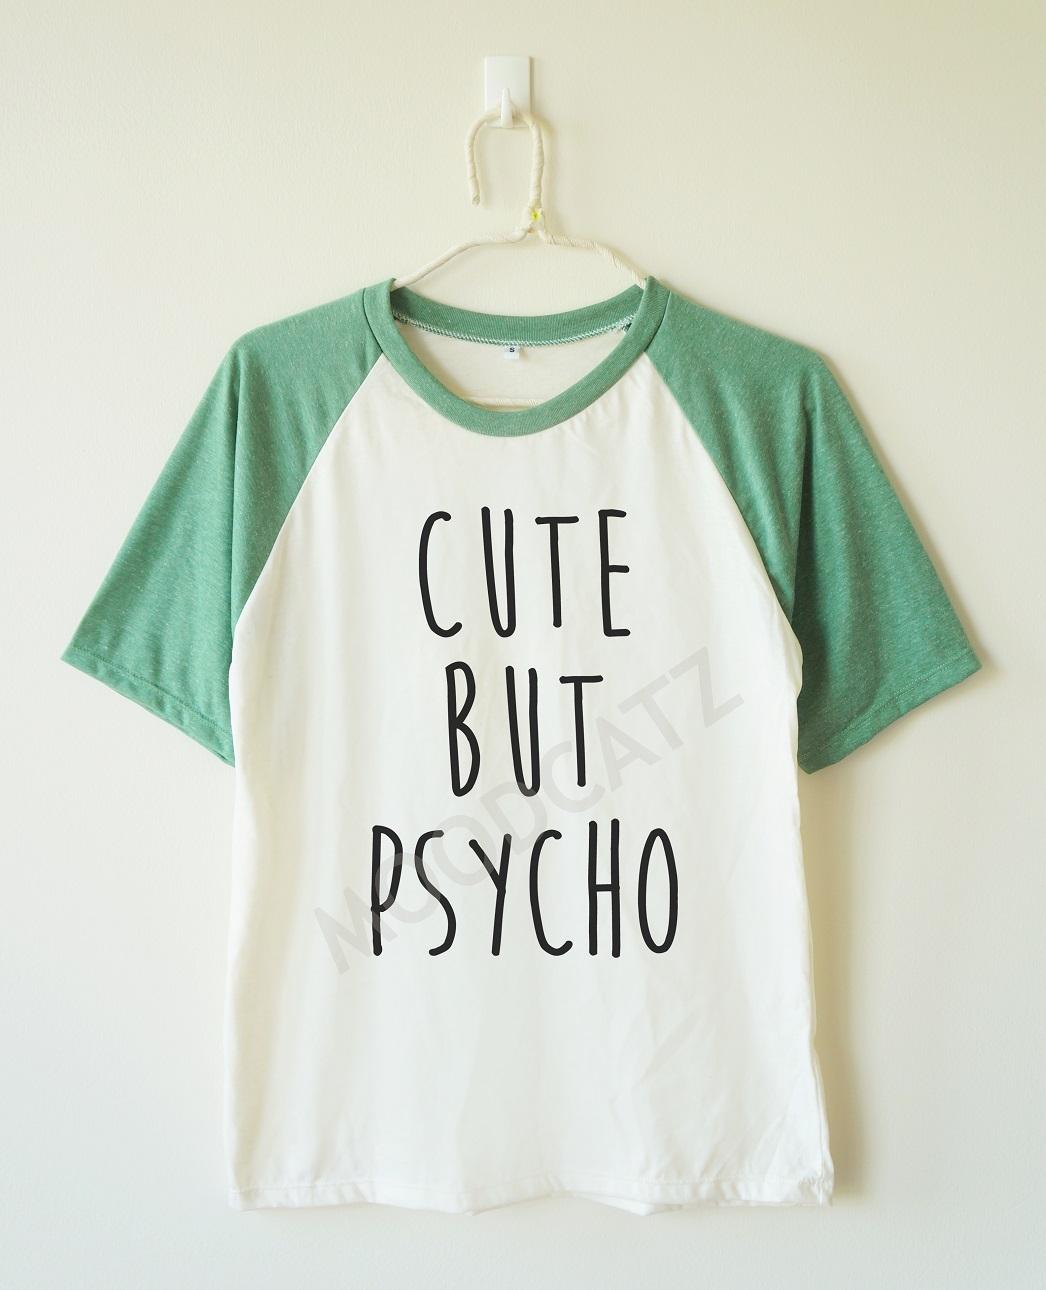 cute_psycho_shirt_baseball_shirt_short_sleeve_shirt_women_shirt_men_shirt_t_shirts_5.jpg